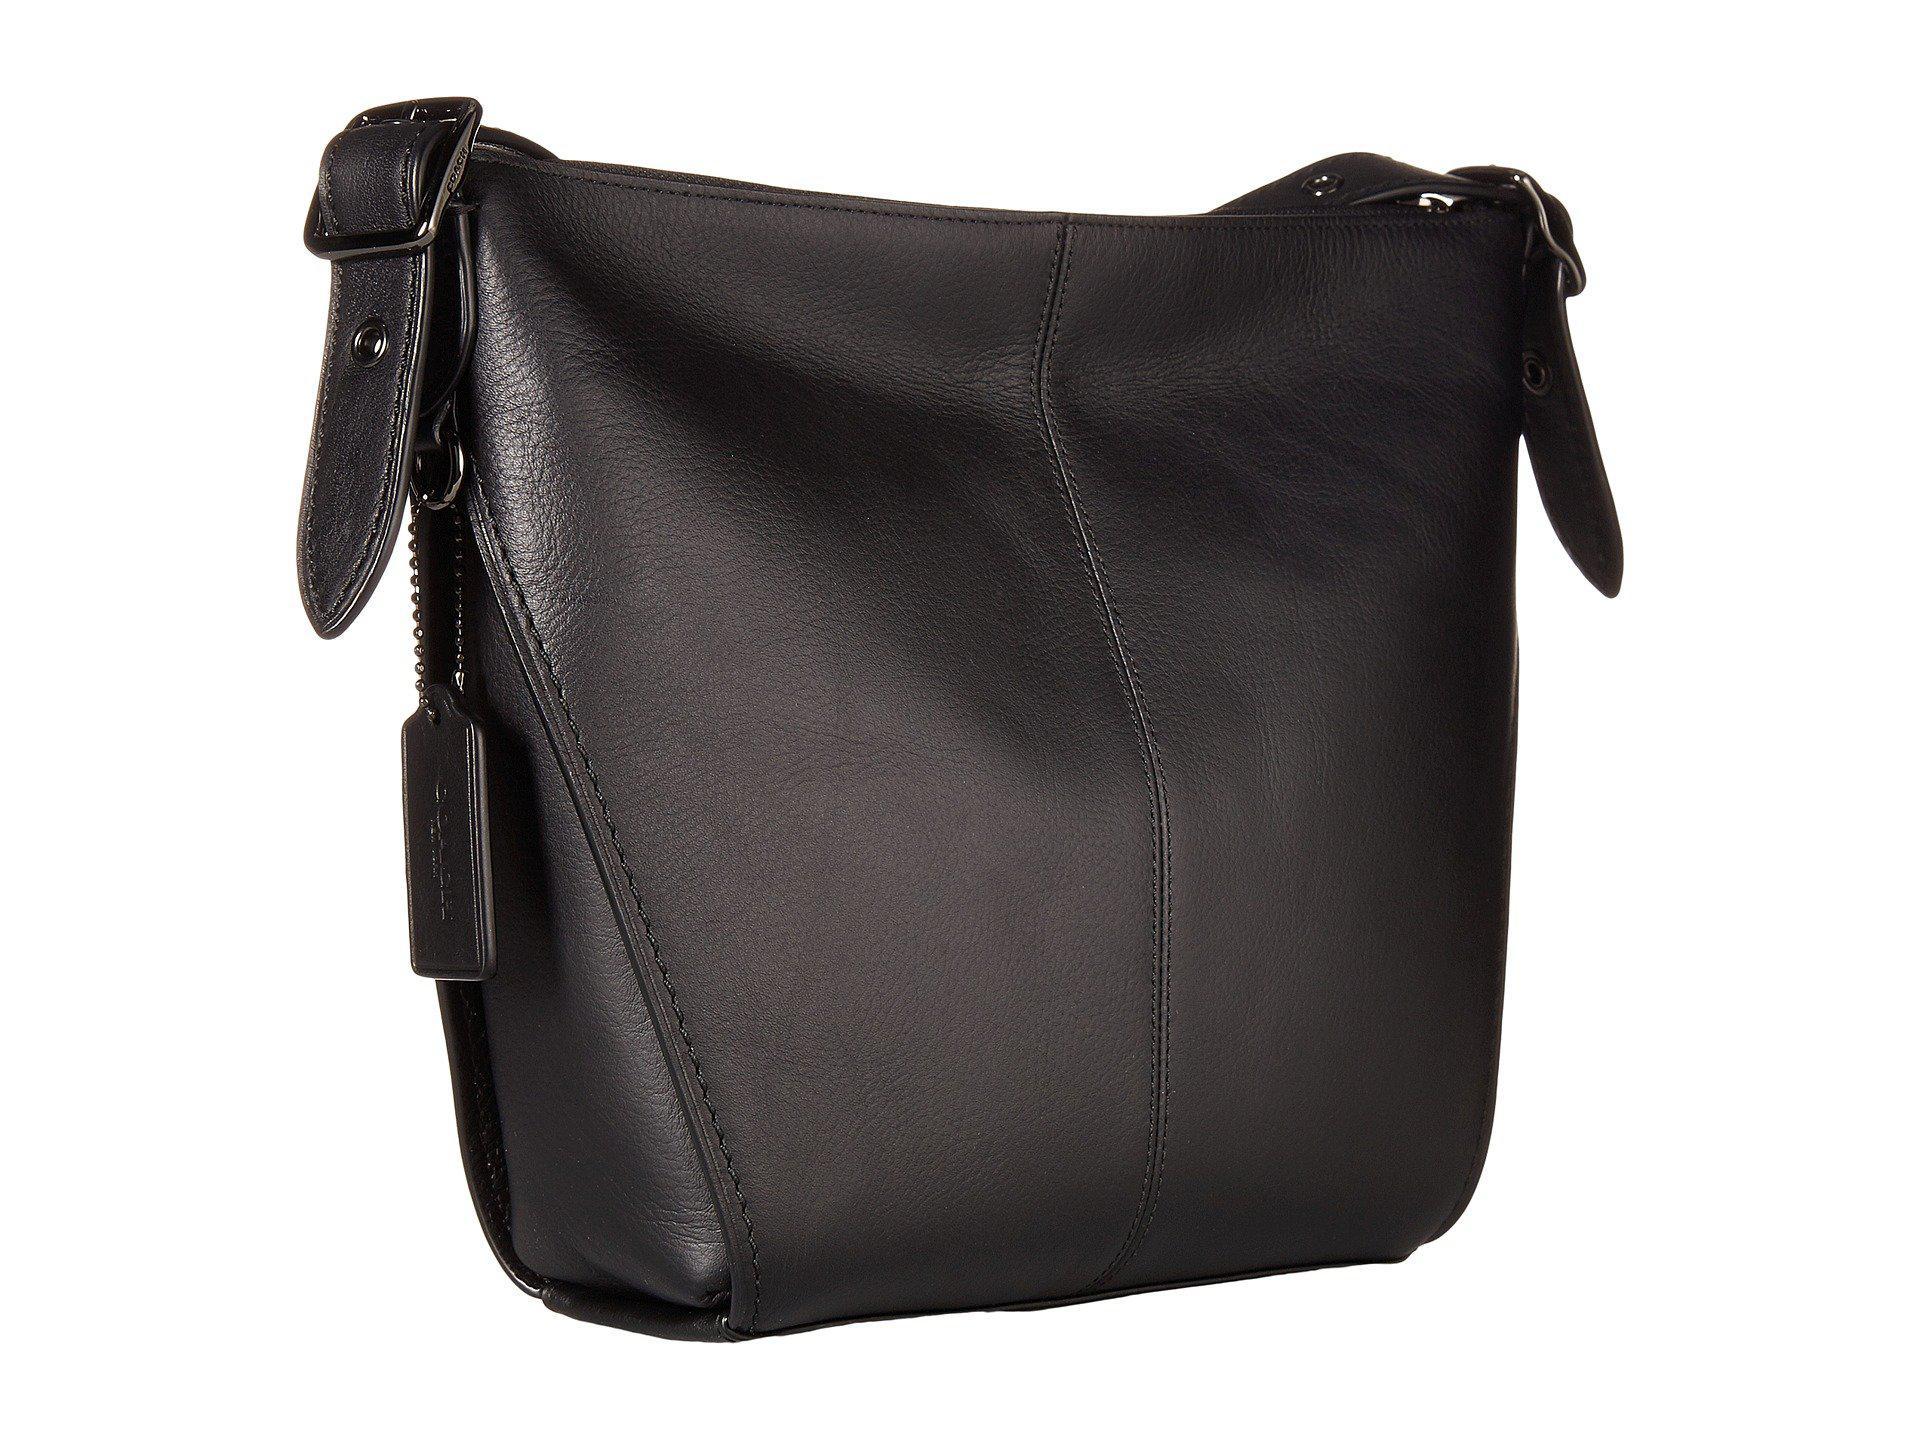 70f402dea017 Lyst - COACH Small Dufflette In Natural Calf Leather (dk chalk ...